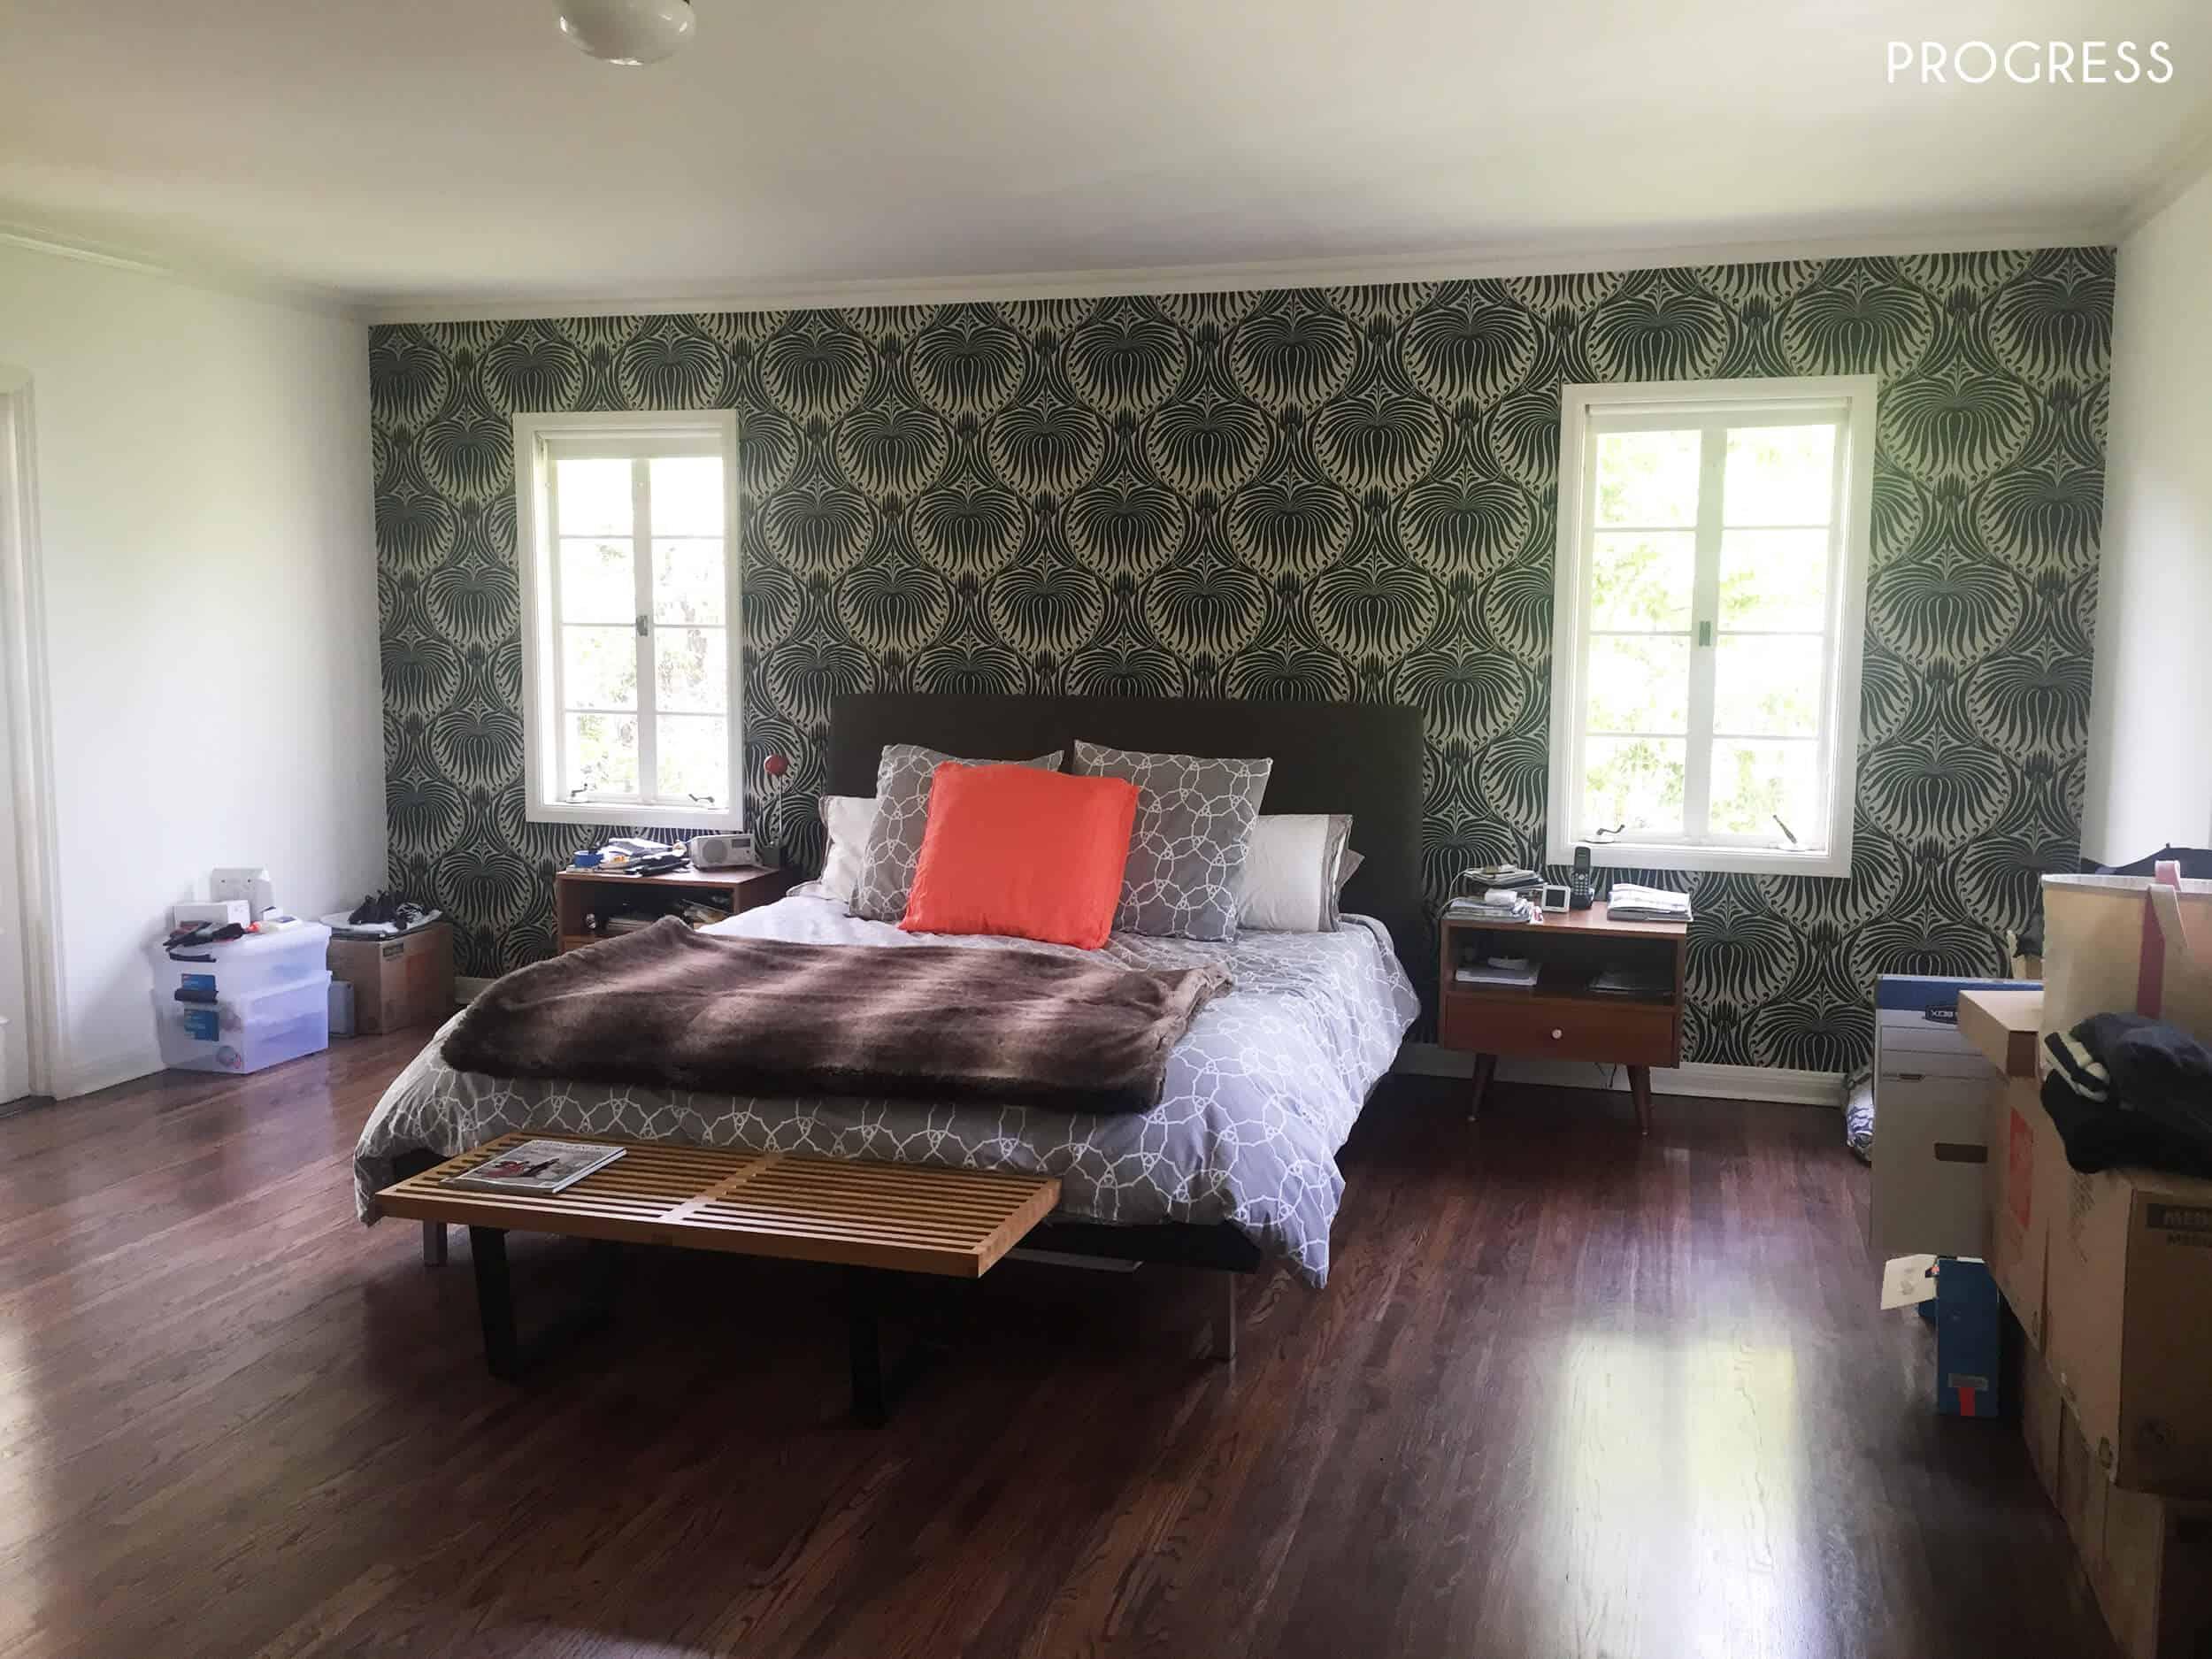 Emily-Henderson_Griffith-Park-Home_Traditional_Italian_Mid-Century_Master-Bedroom_Progress_4